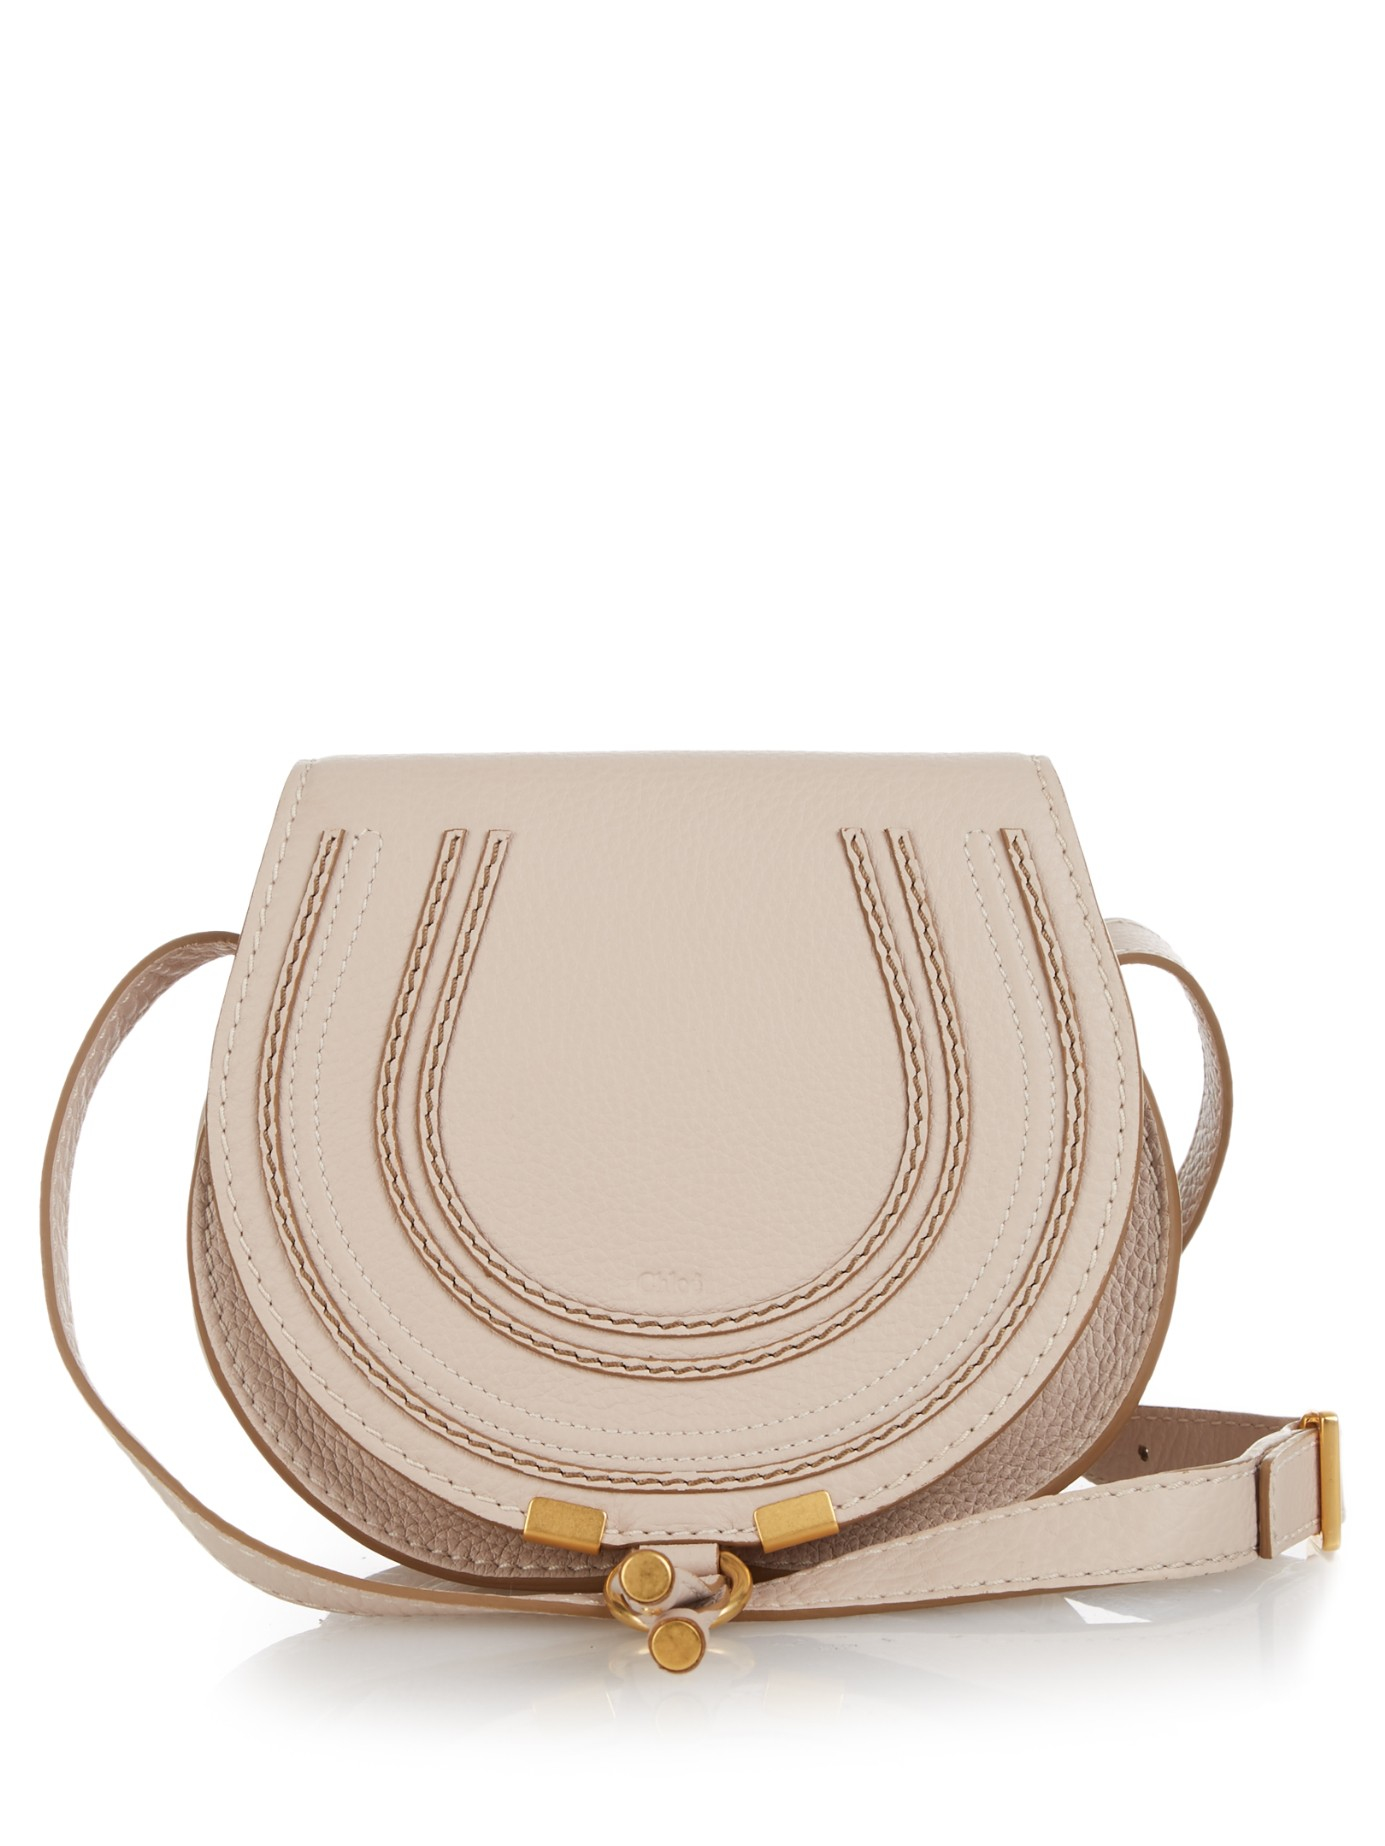 Chlo¨¦ Marcie Mini Leather Cross-body Bag in Beige (CREAM) | Lyst